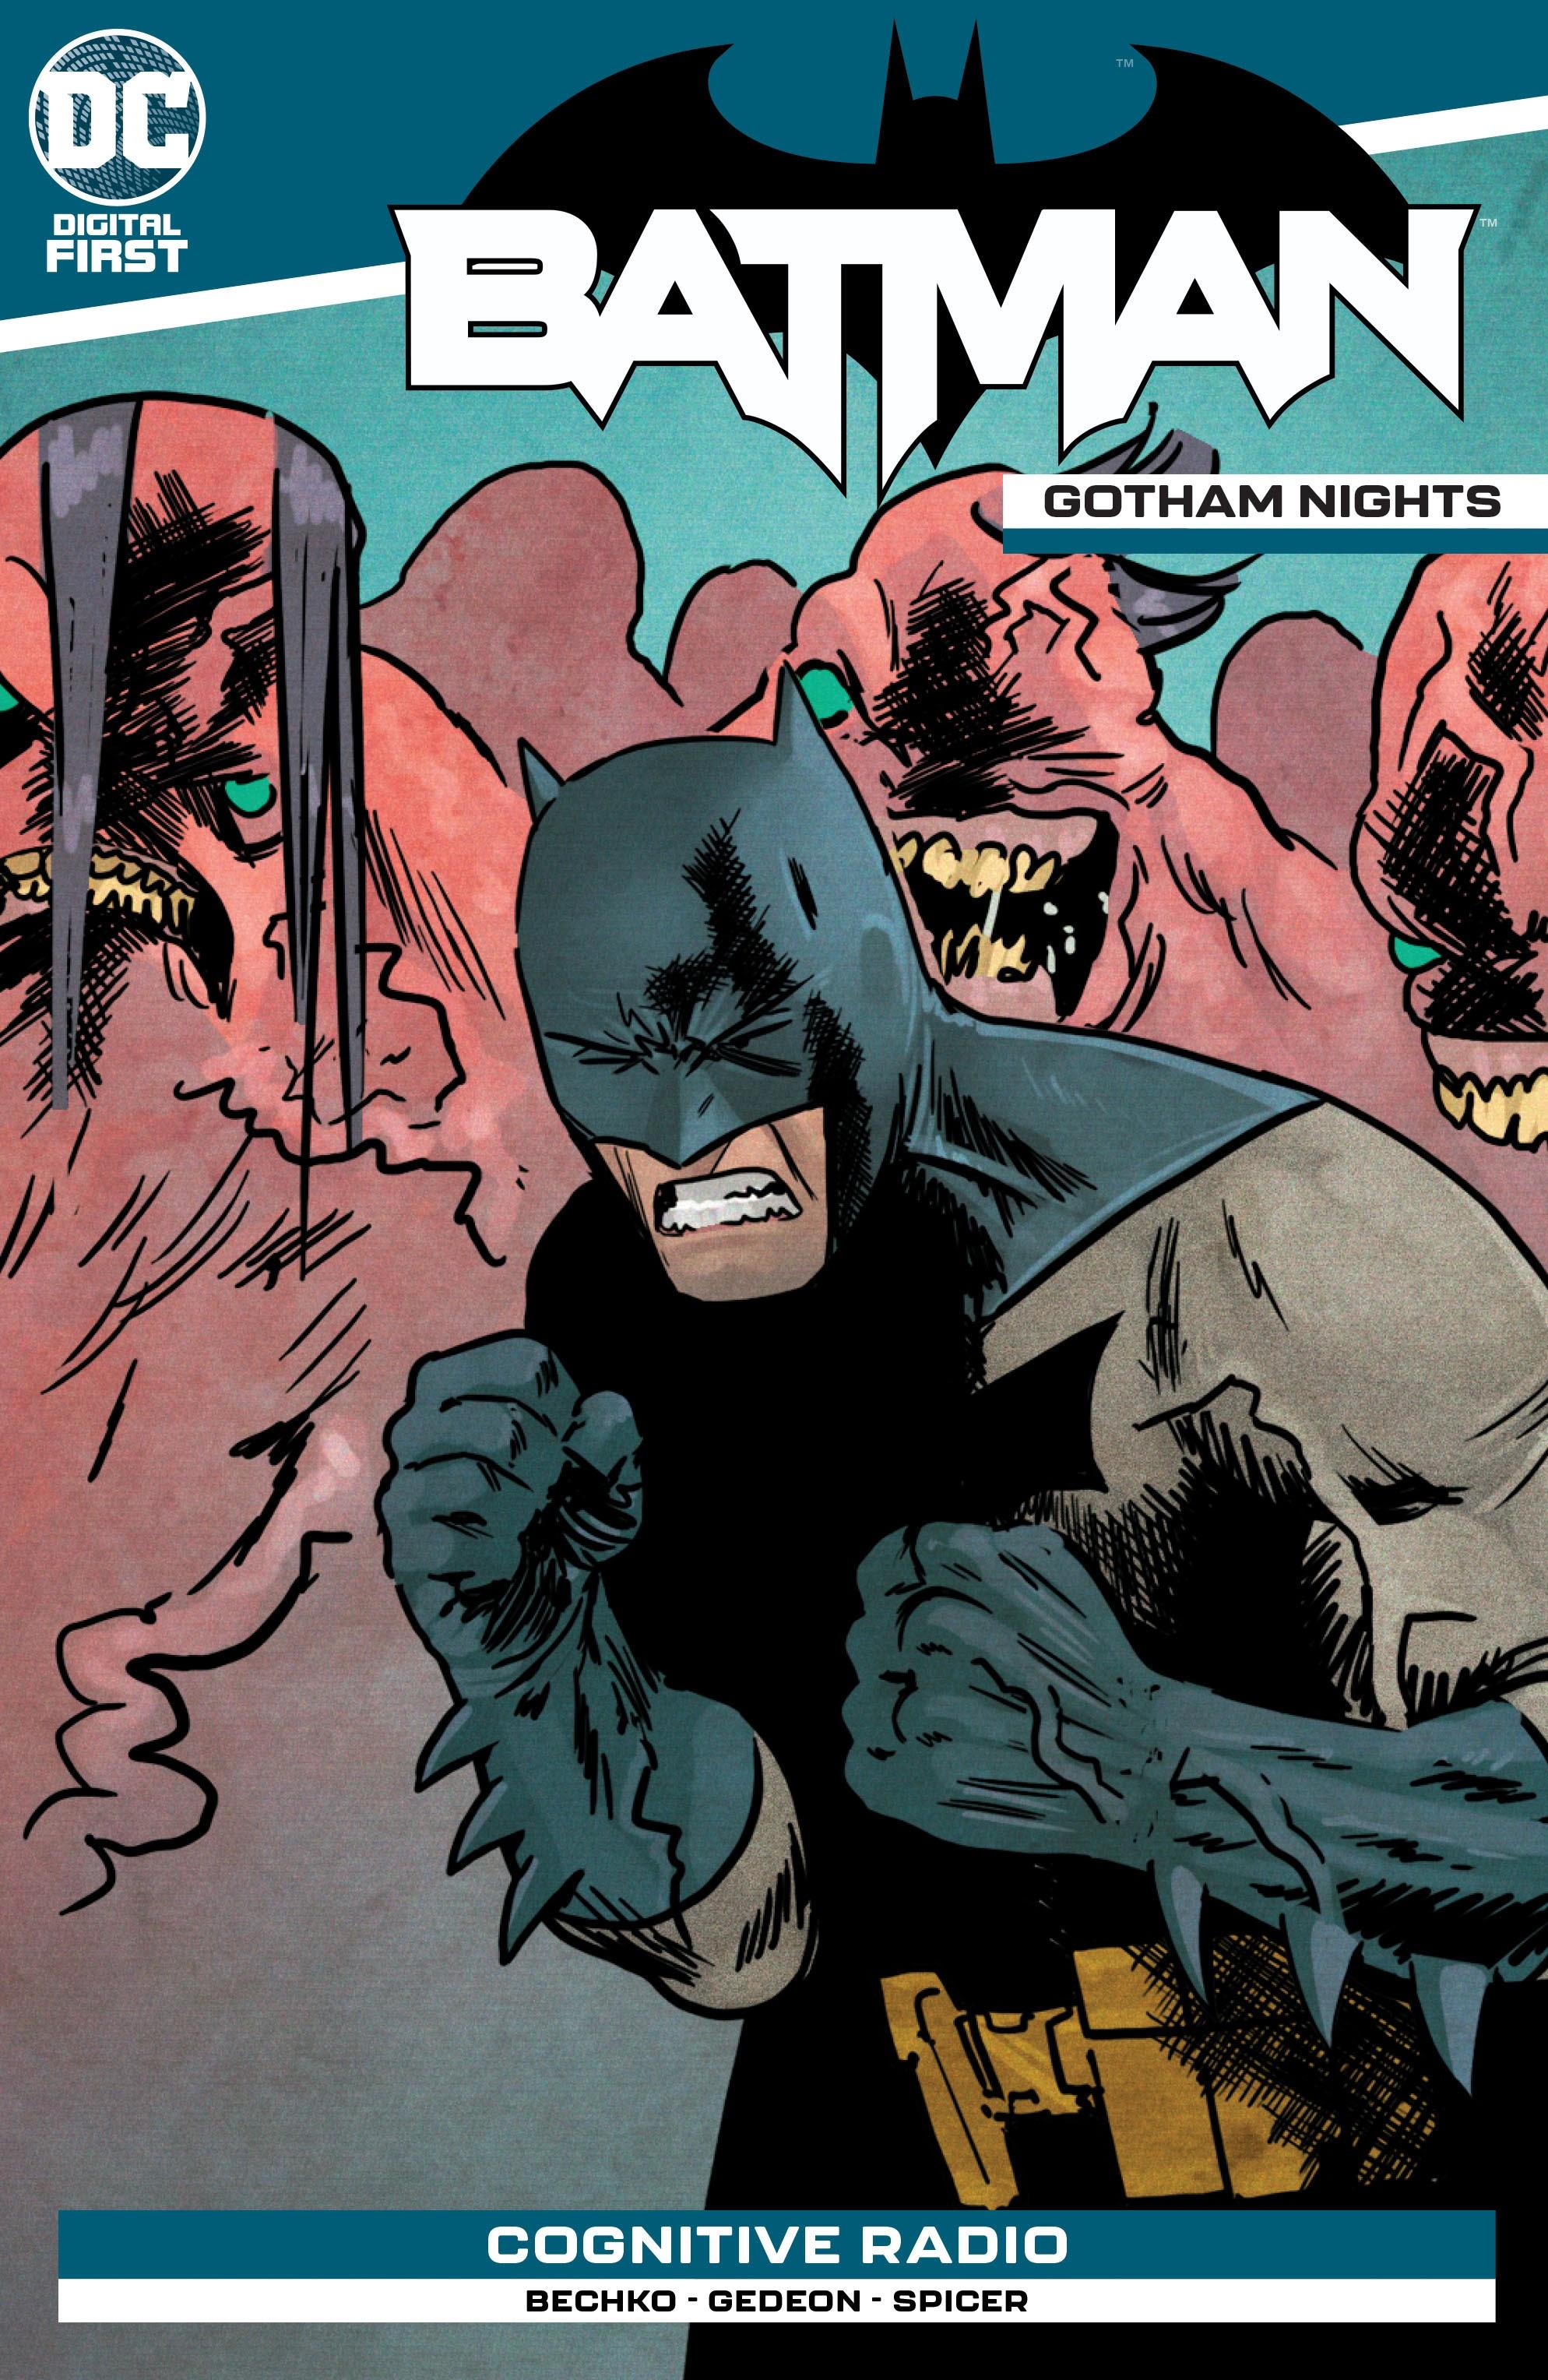 Batman: Gotham Nights Vol 1 21 (Digital)